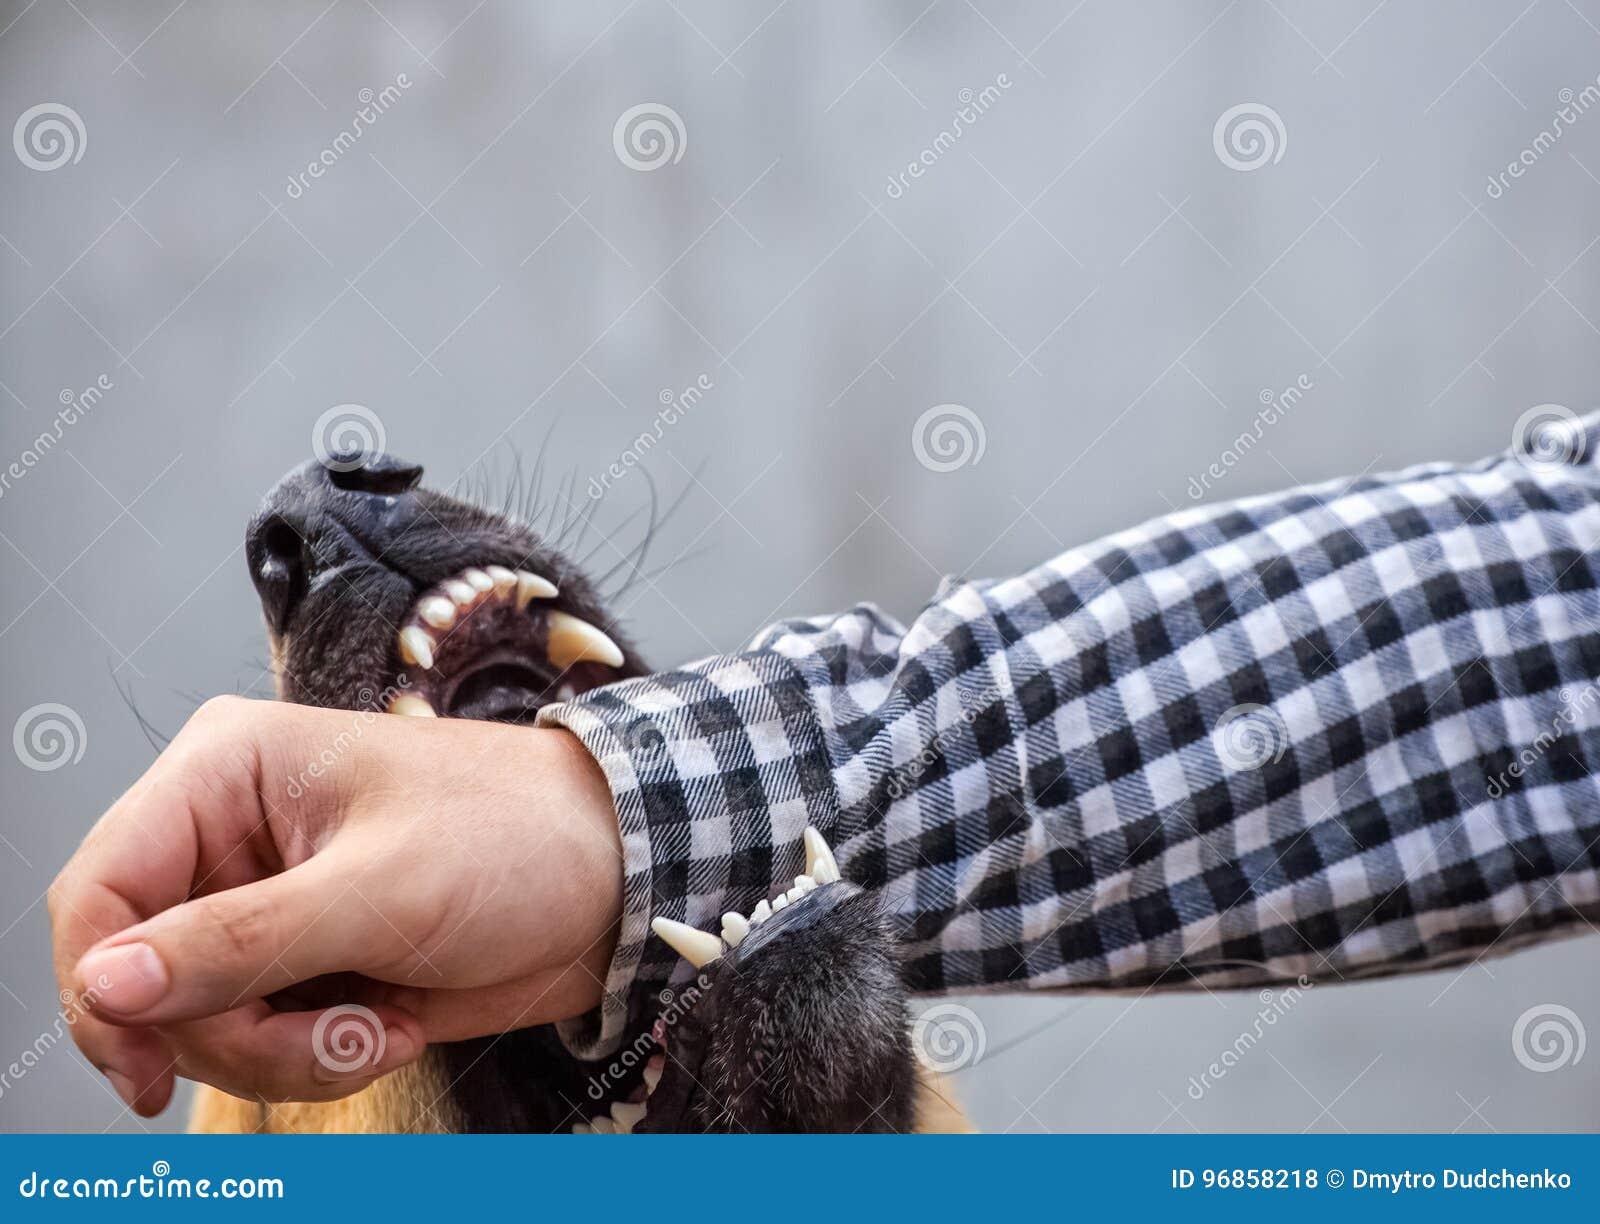 Male German shepherd bites a man by the hand